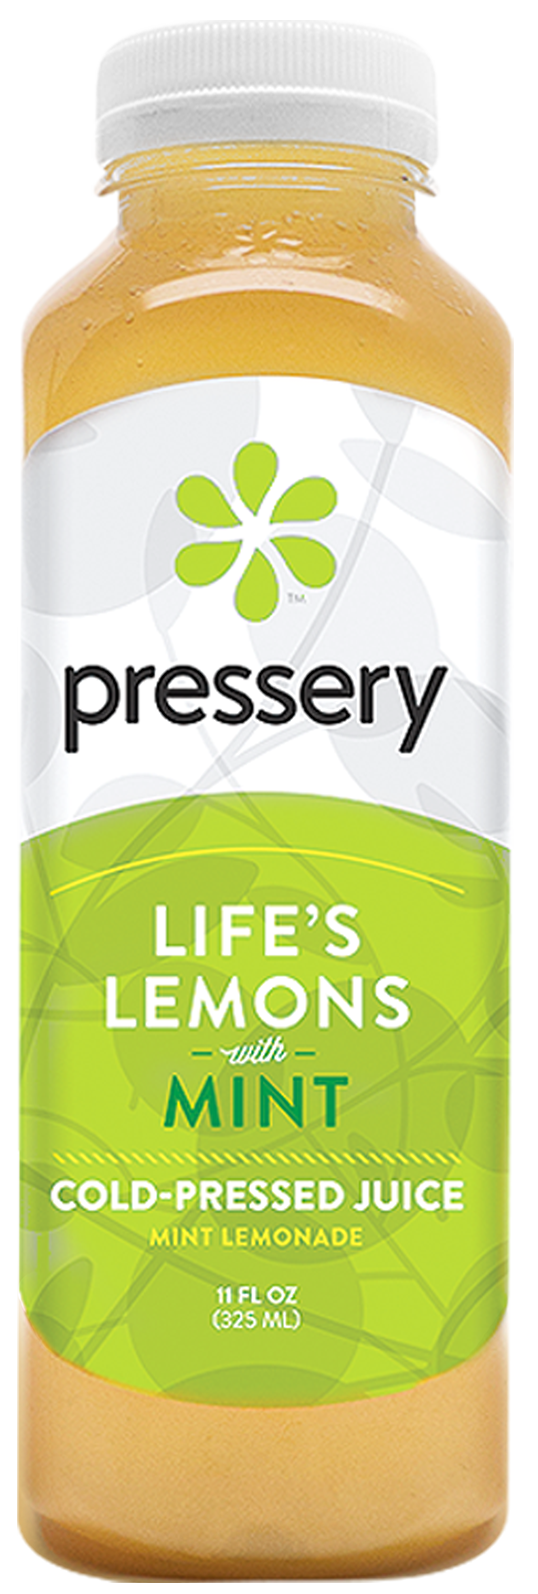 Life's_Lemons_Mint.png